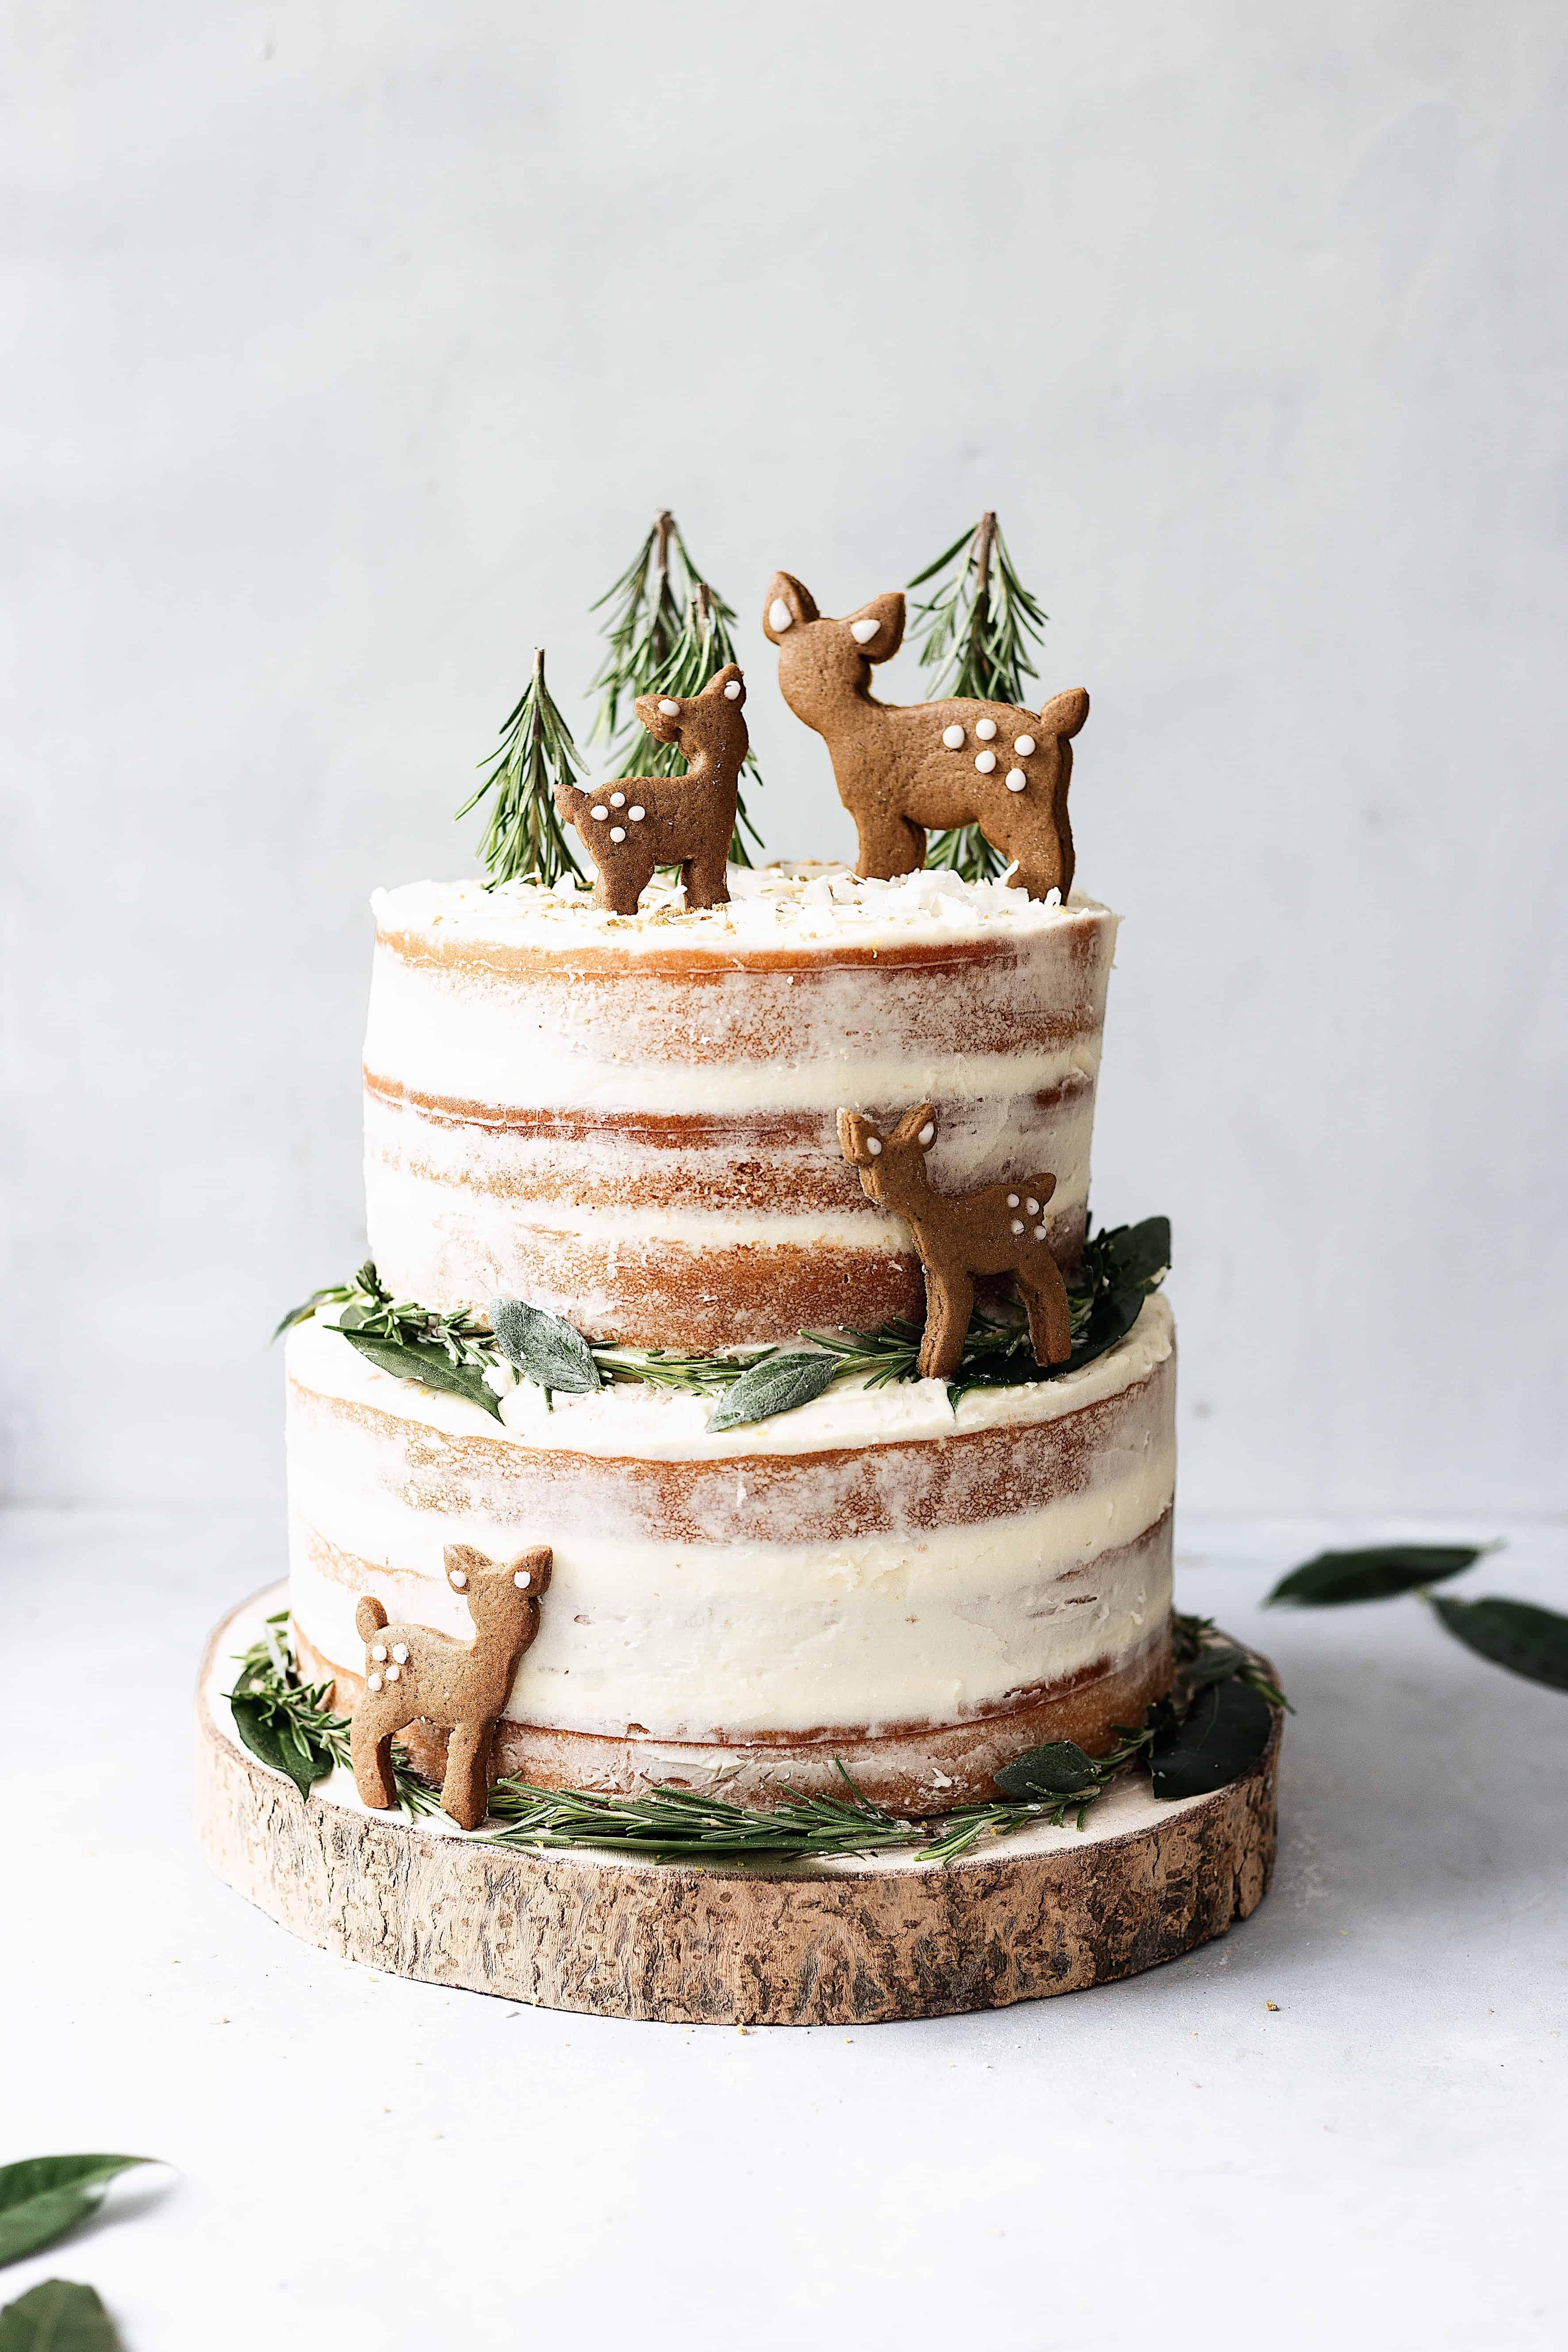 Vegan Lemon & Elderflower Cake with Chai Spice Biscuits